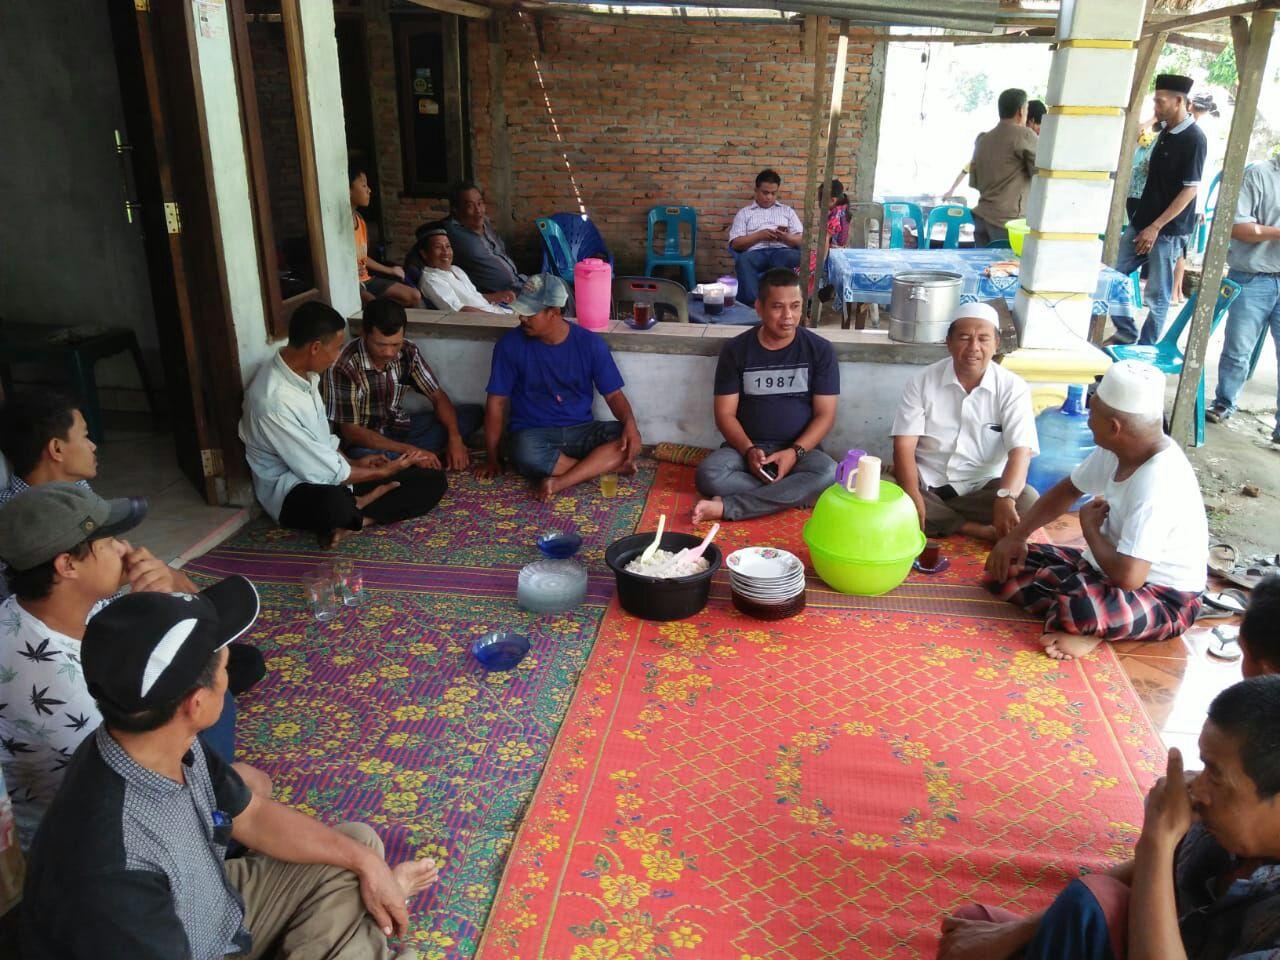 Warga Desa Secanggang Potong 2 Ekor Domba Karena Paslon Terasa Menang